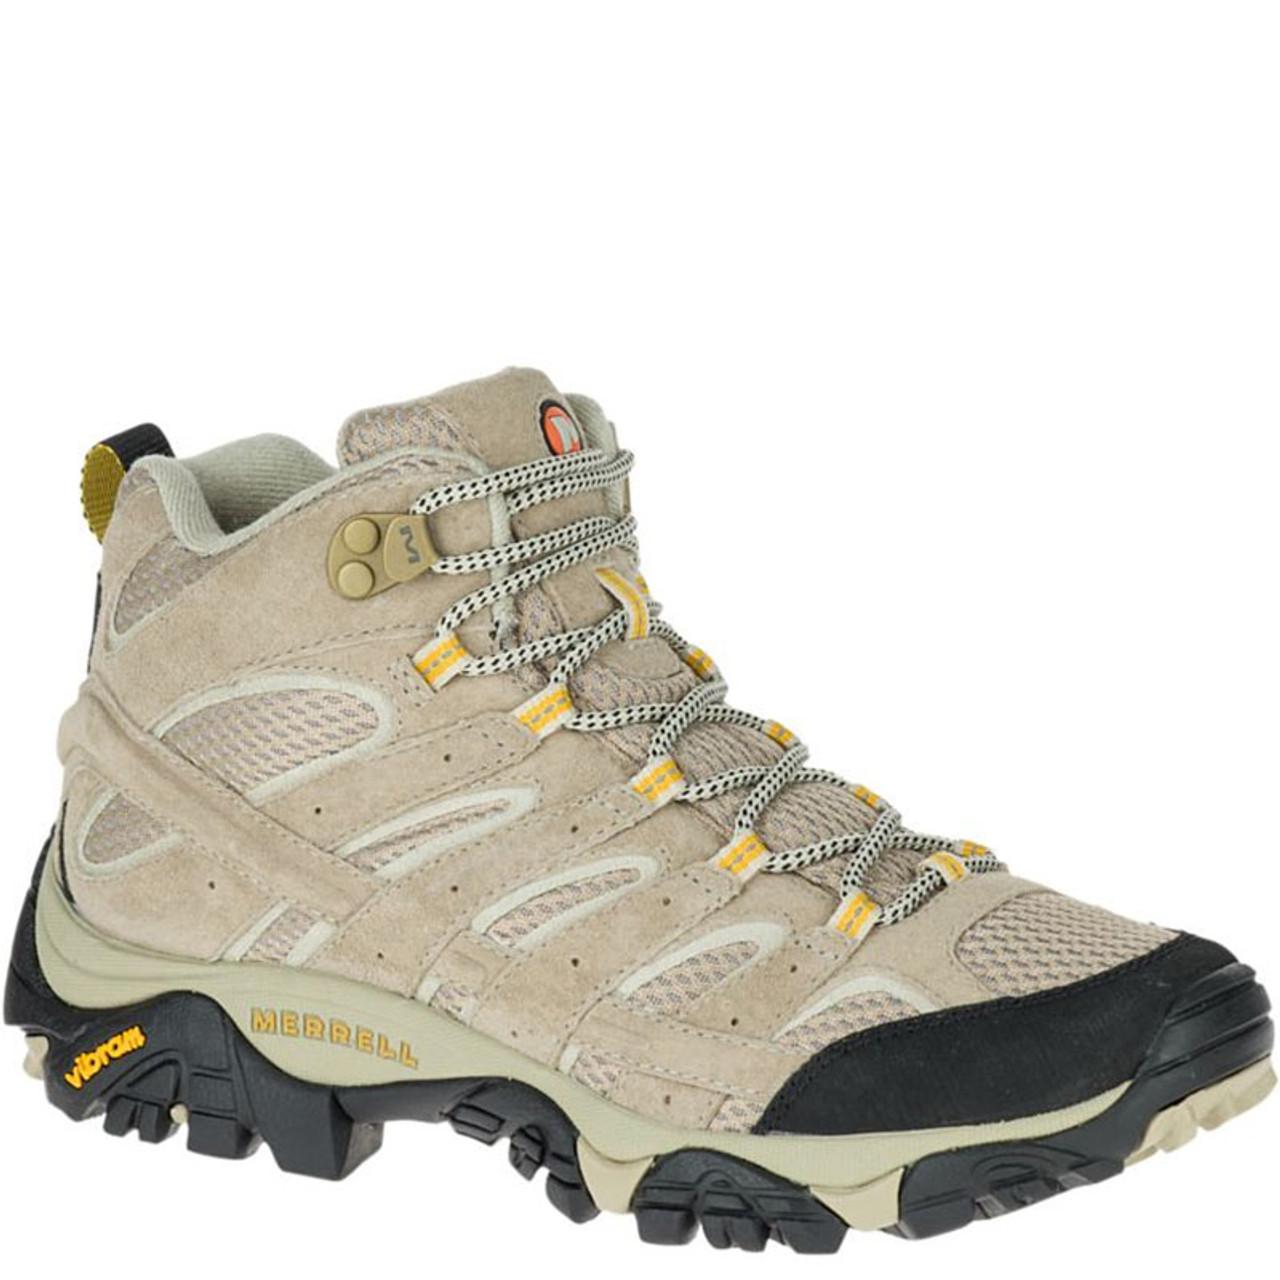 9073d267 Merrell J06048 Women's MOAB 2 VENTILATOR Mid Hiking Boots Taupe